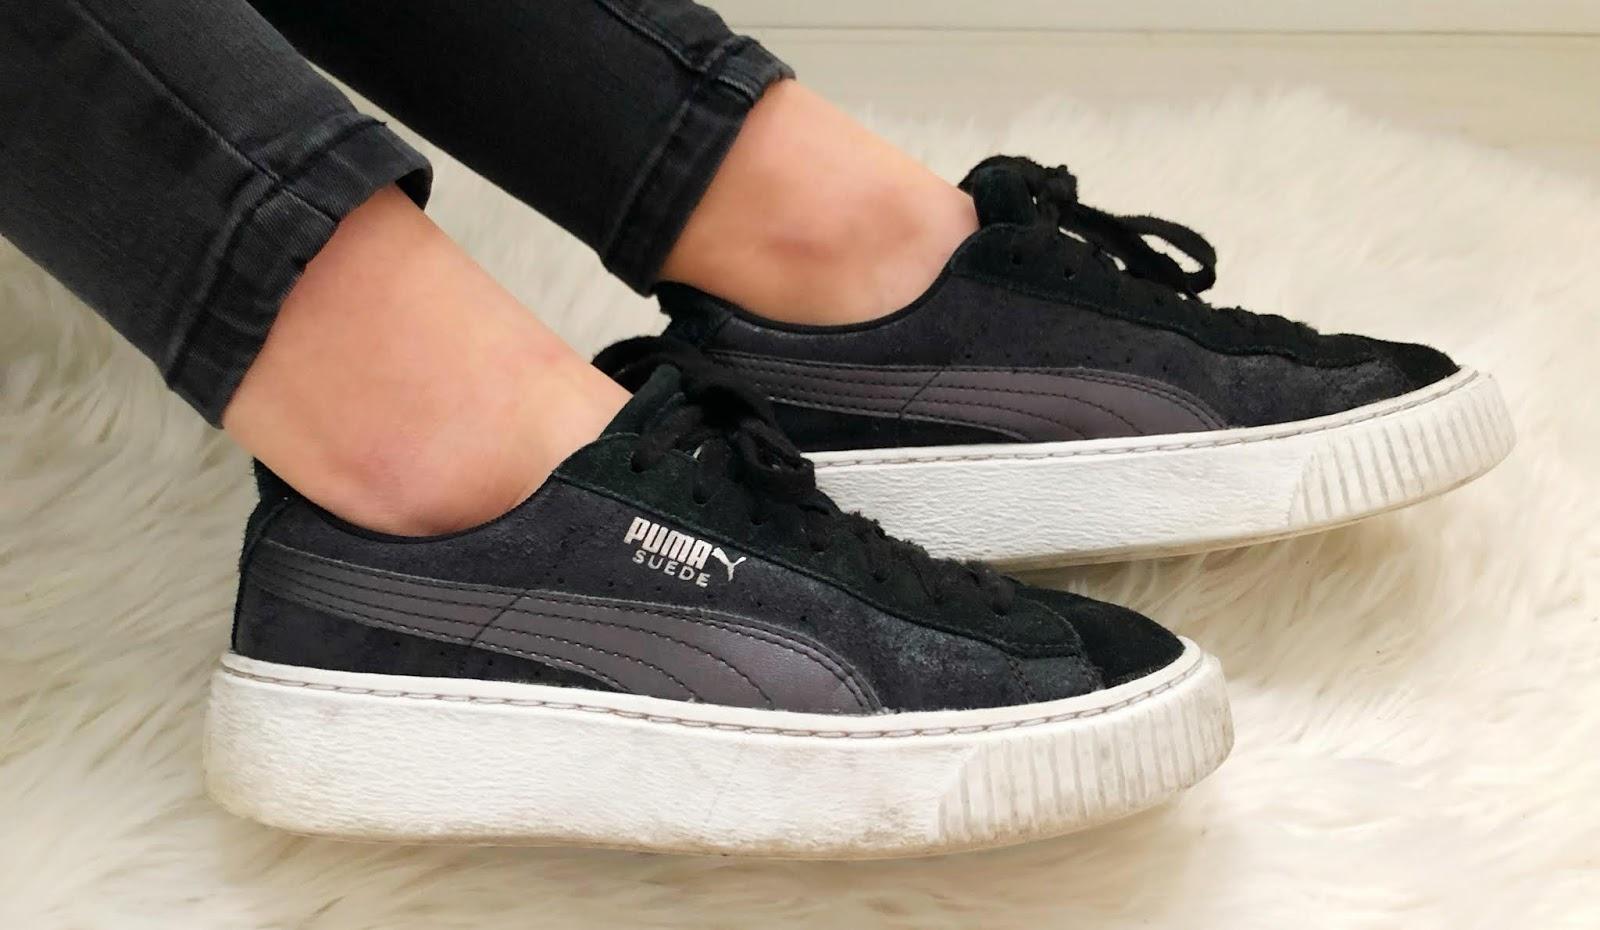 Puma Sneakers voor de Lente | Fortifesti